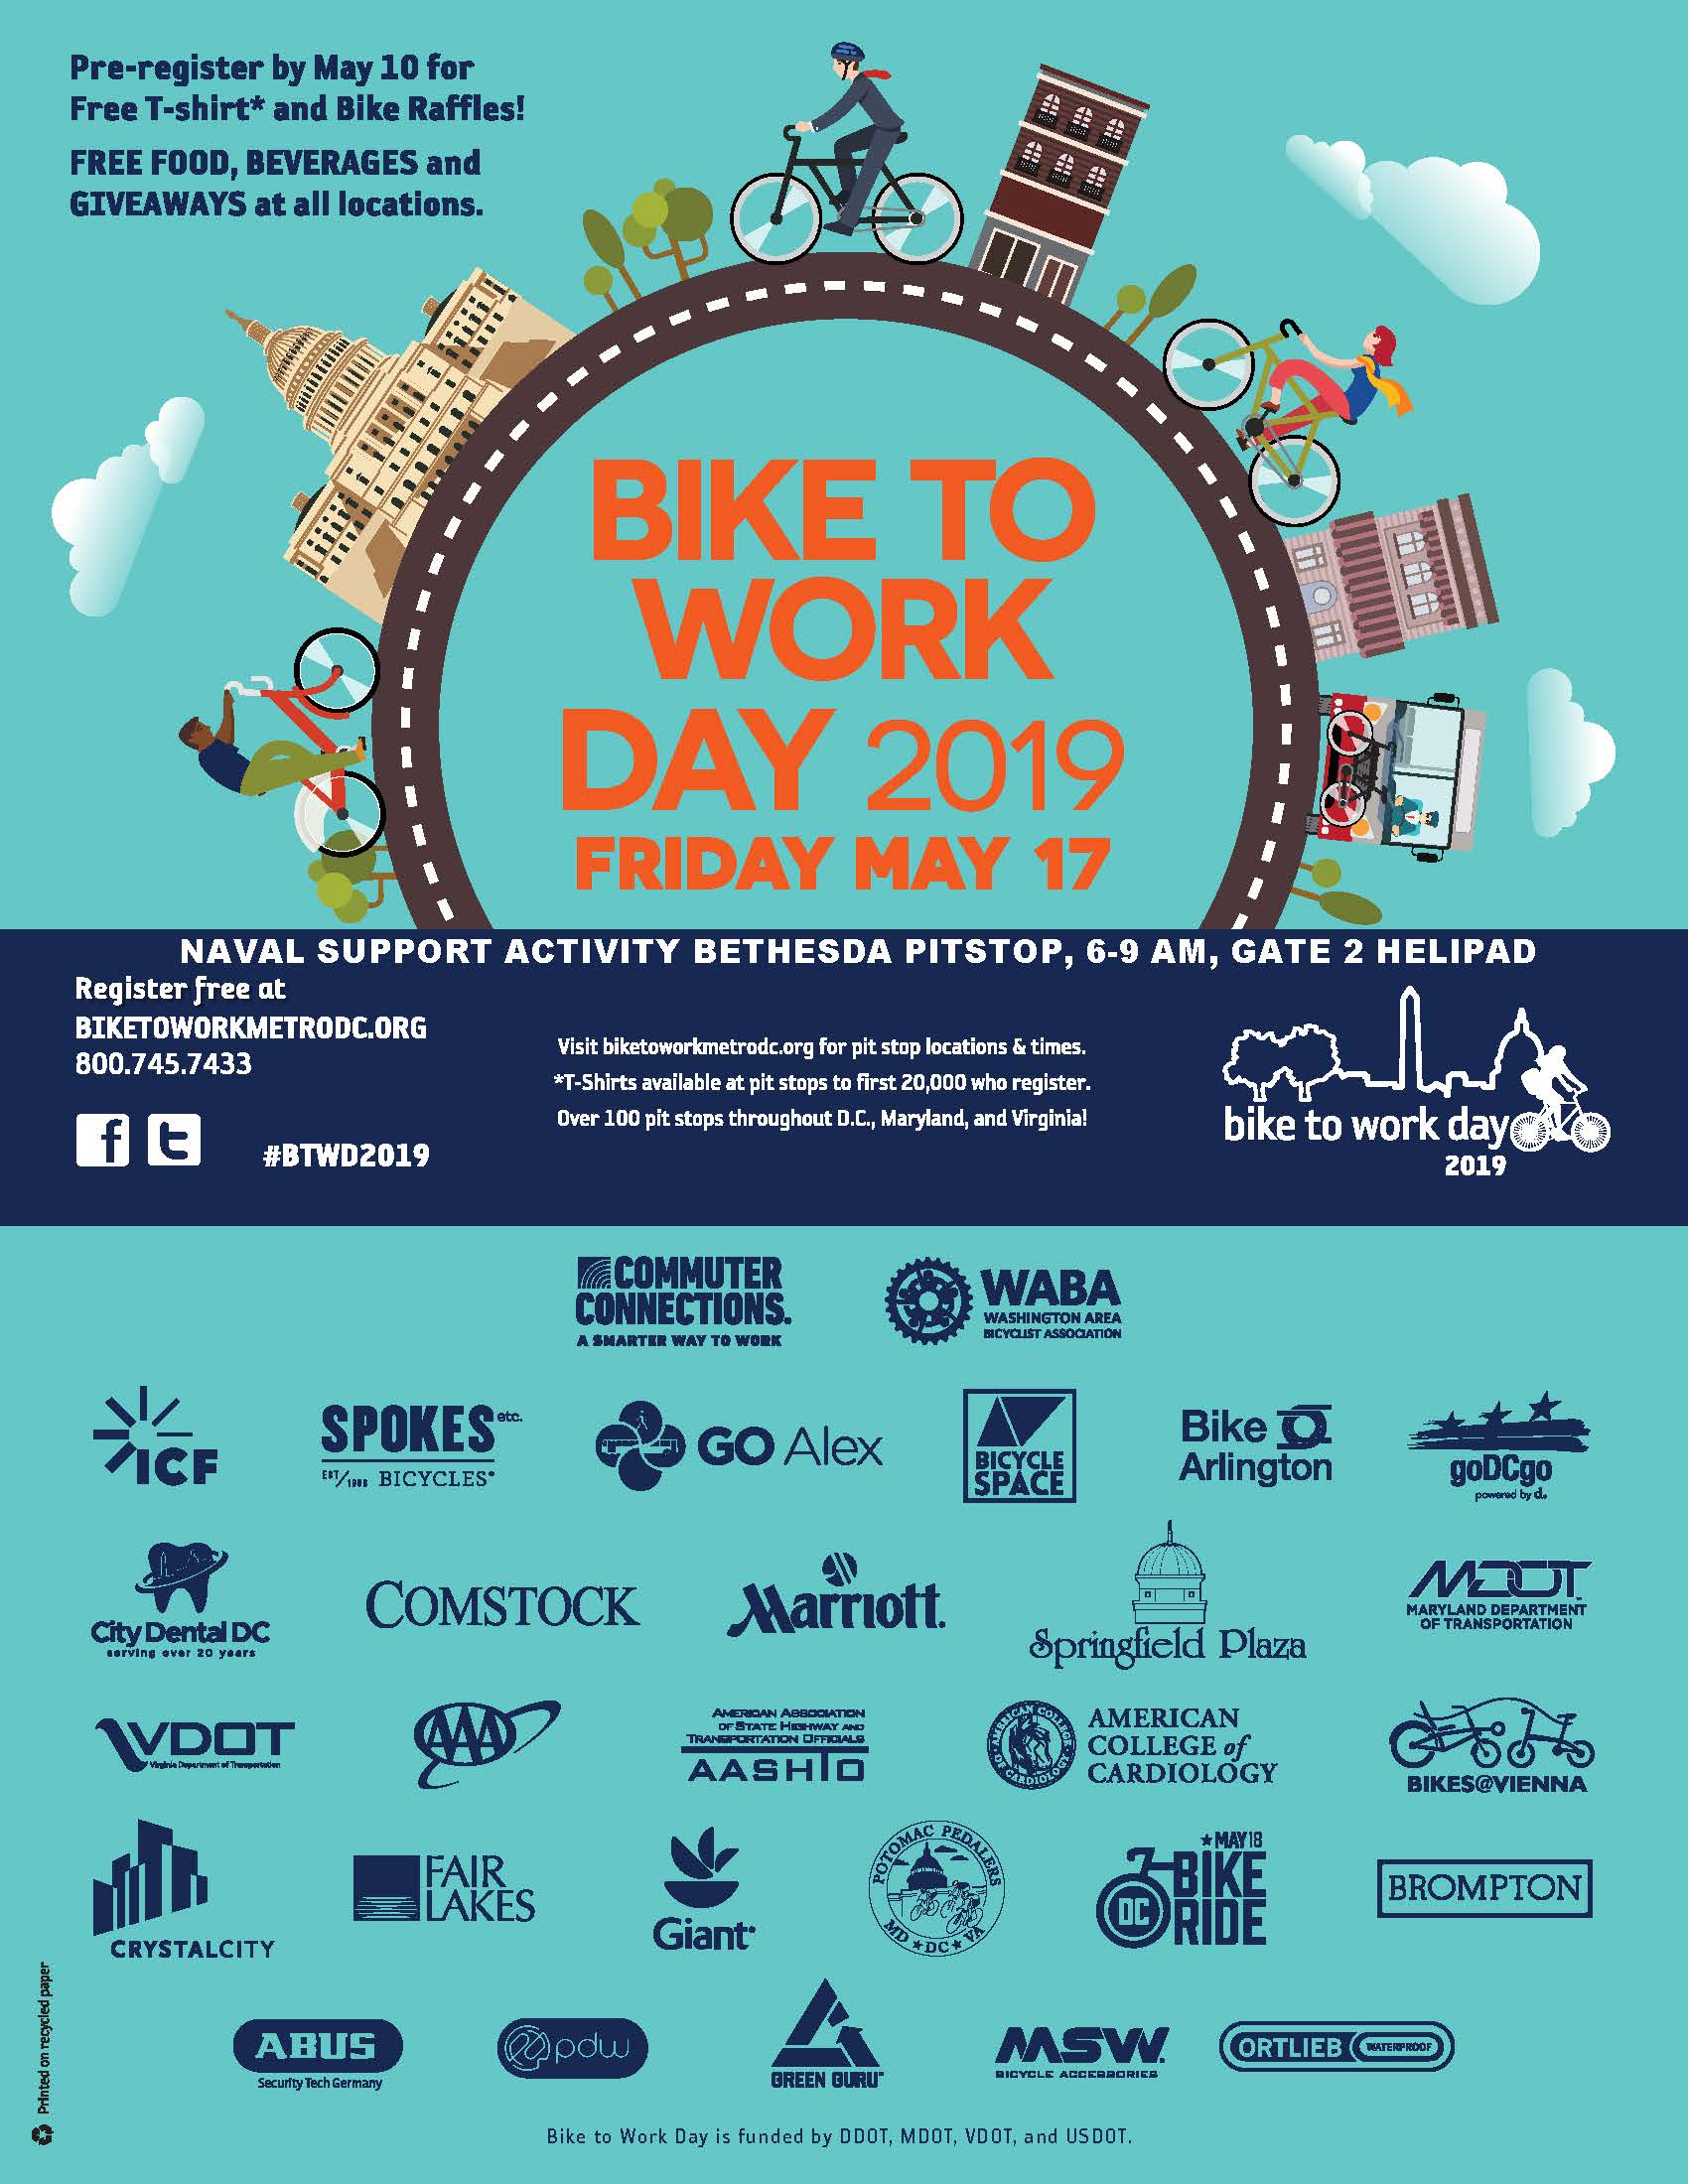 bike_to_work_day_2019.jpg